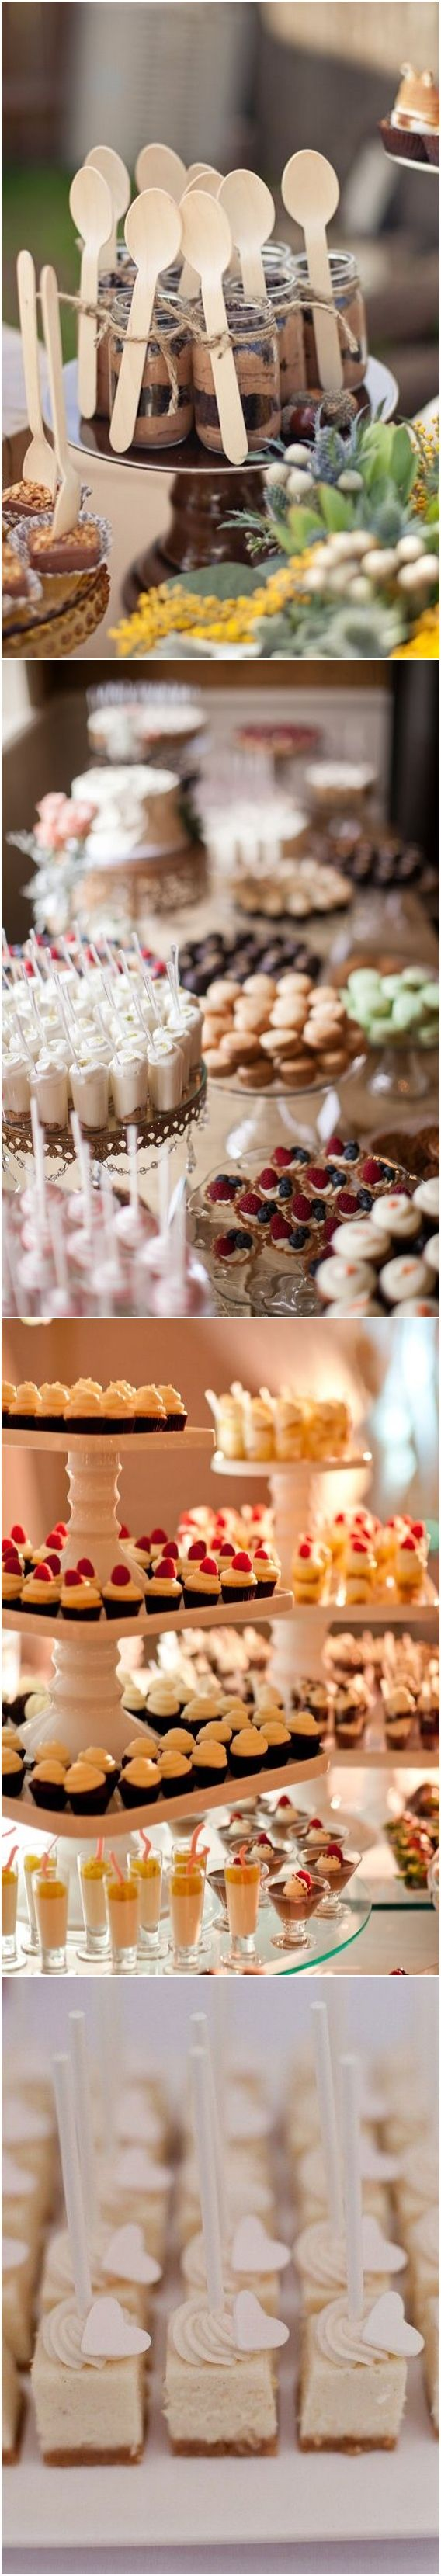 Top 20 Wedding Mini Desserts for 2018